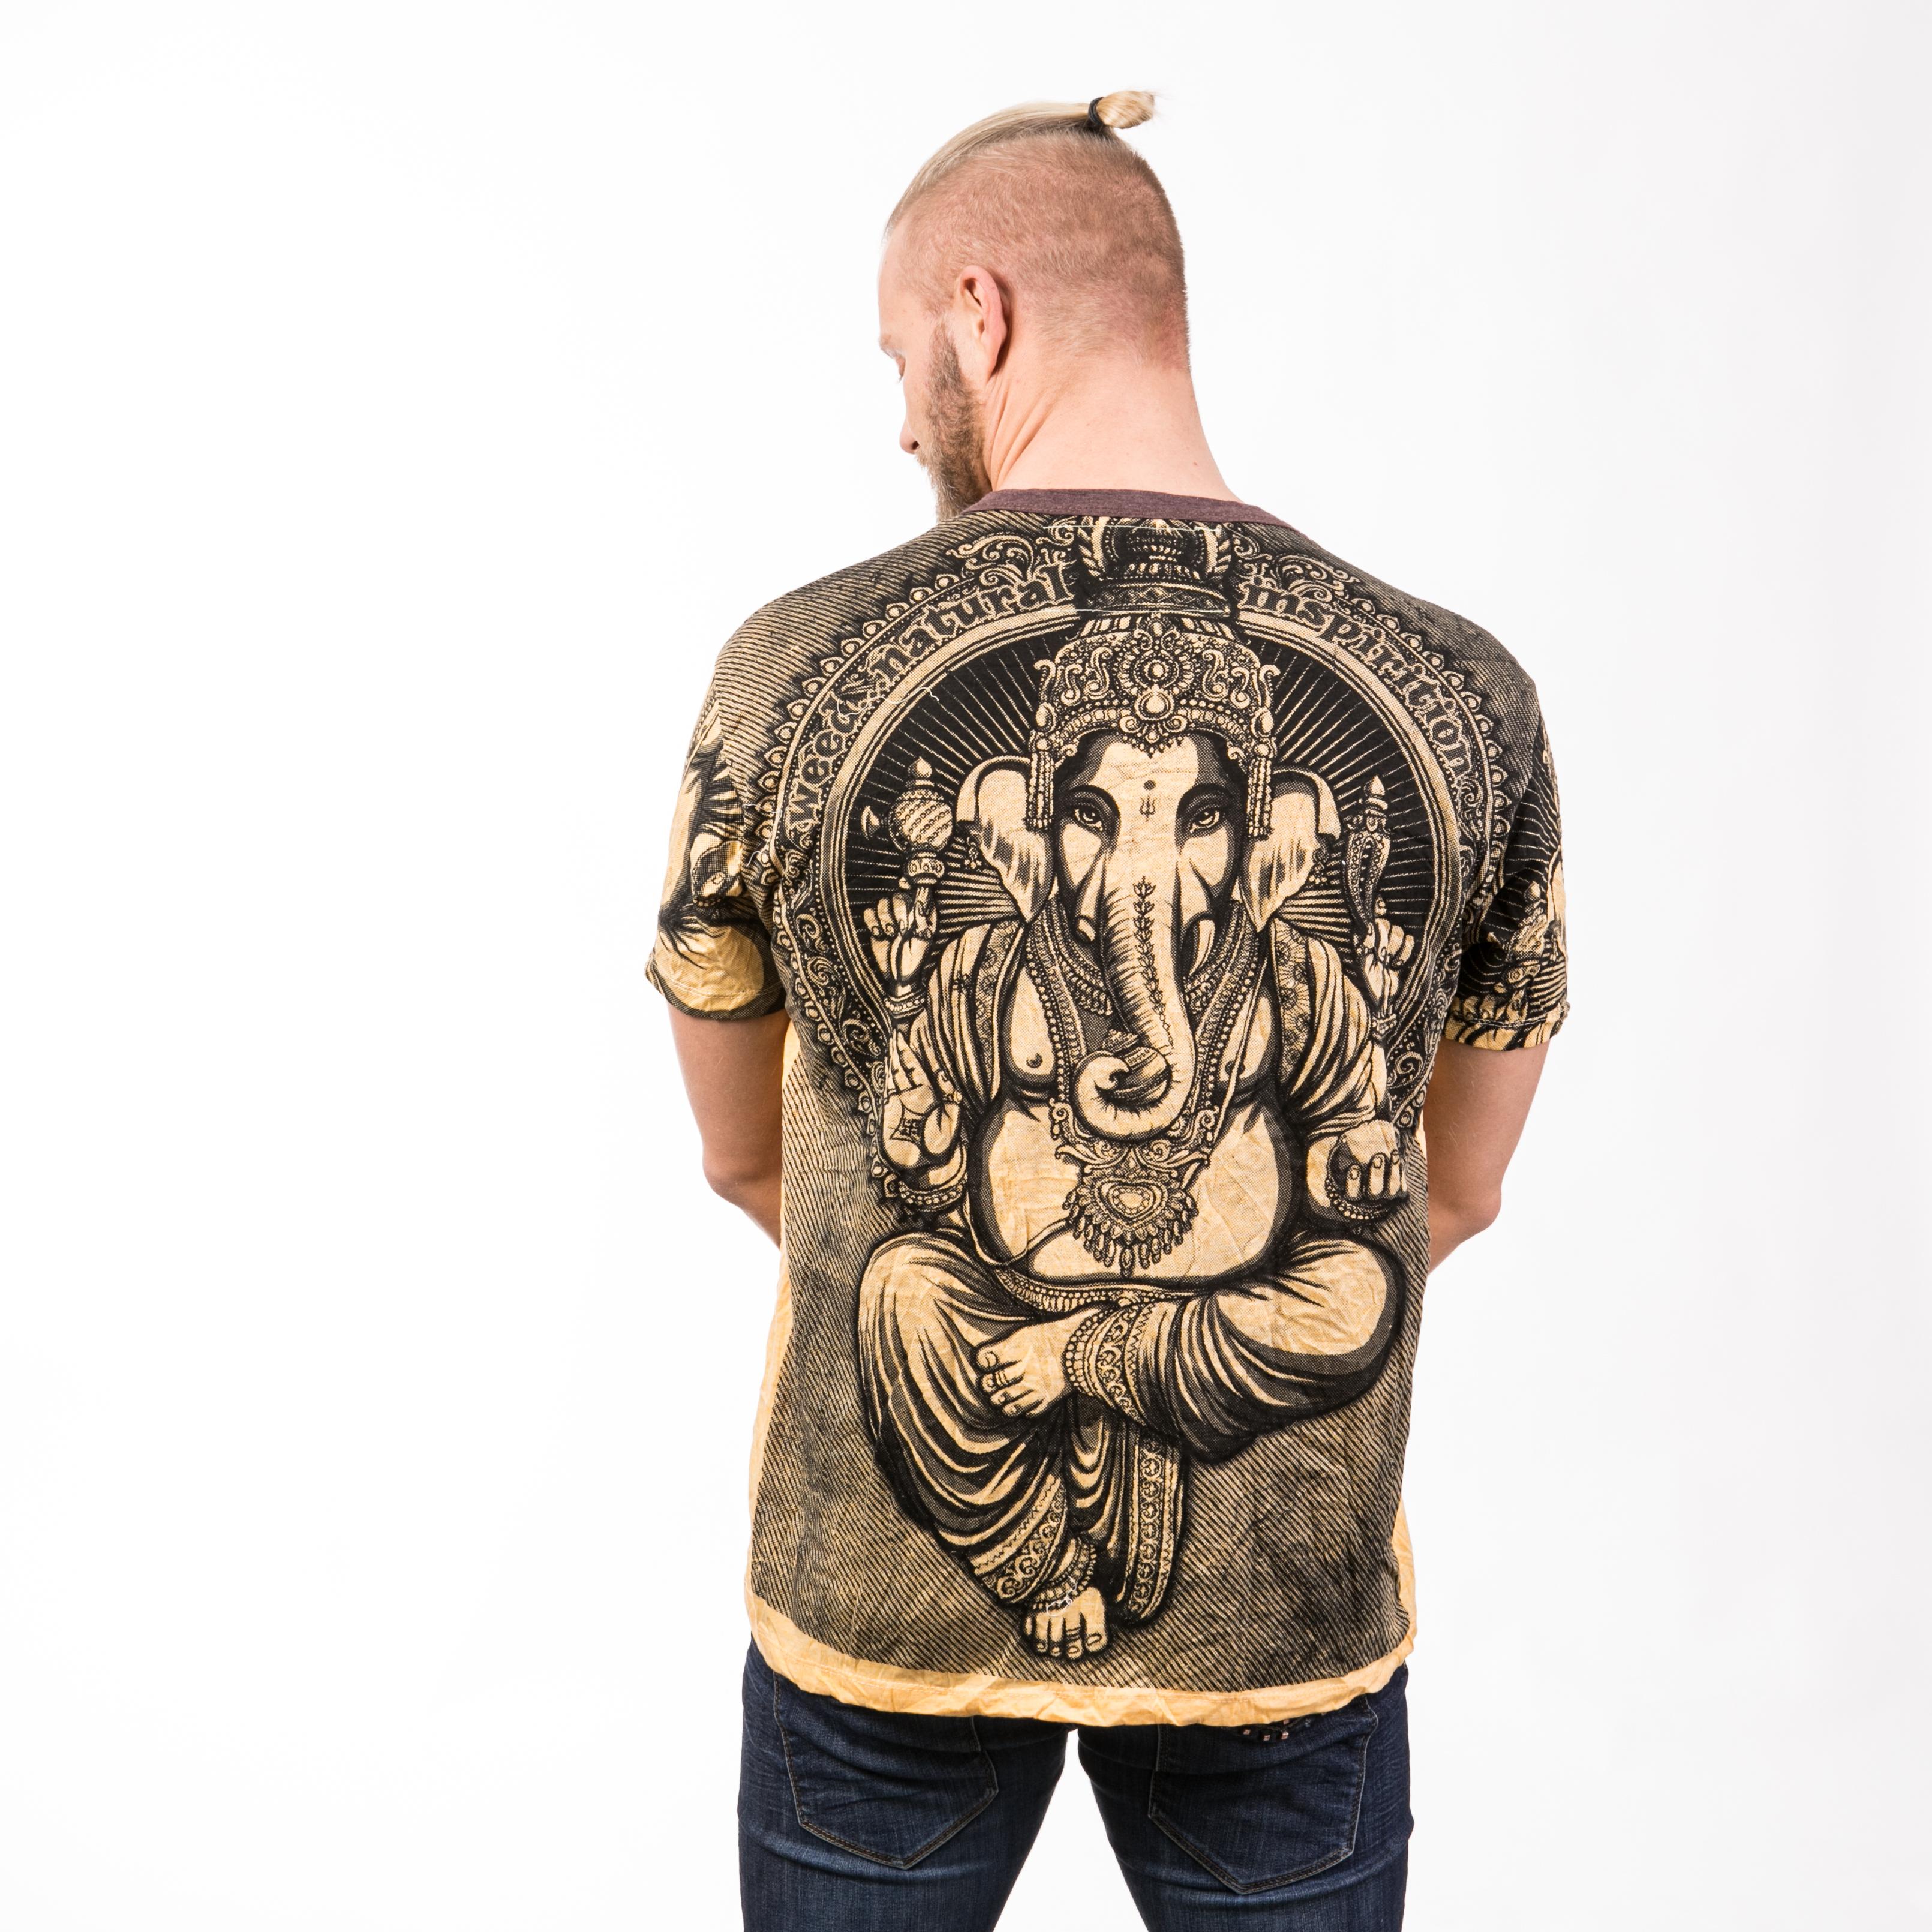 Elephant God Tattoo Www Topsimages Com